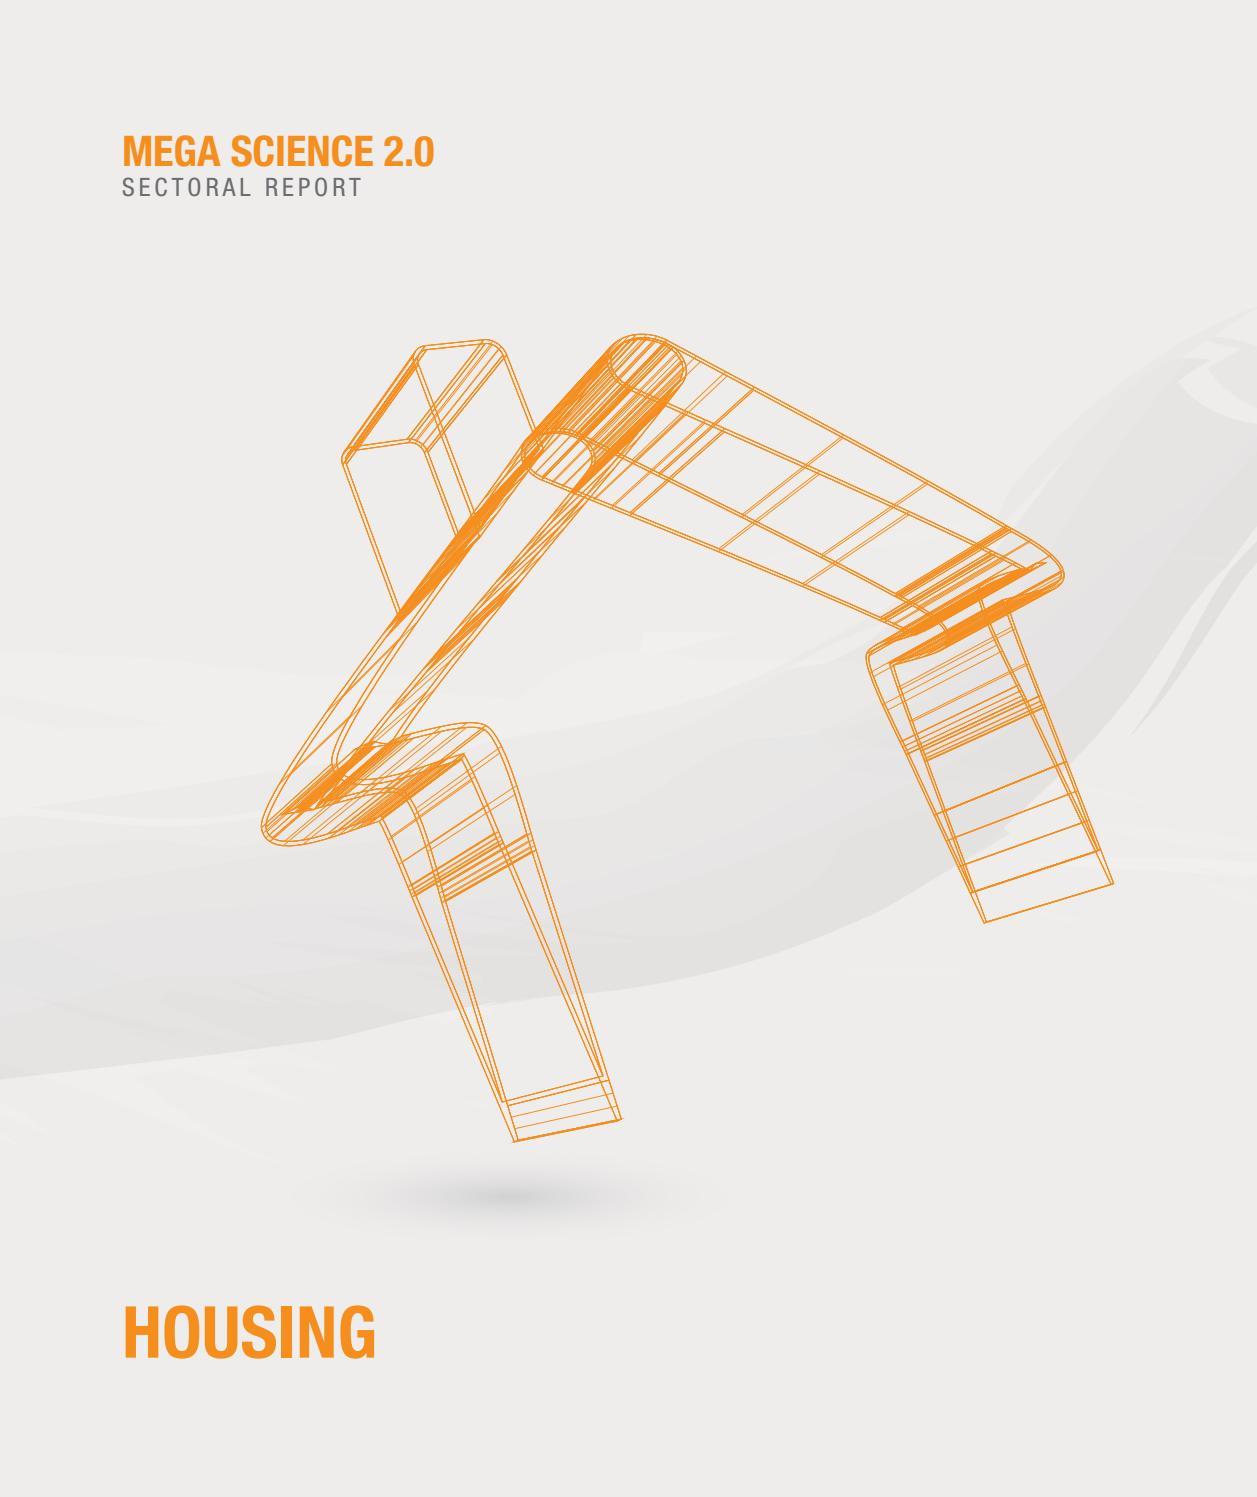 Mega Science 2 0 - Housing Sector